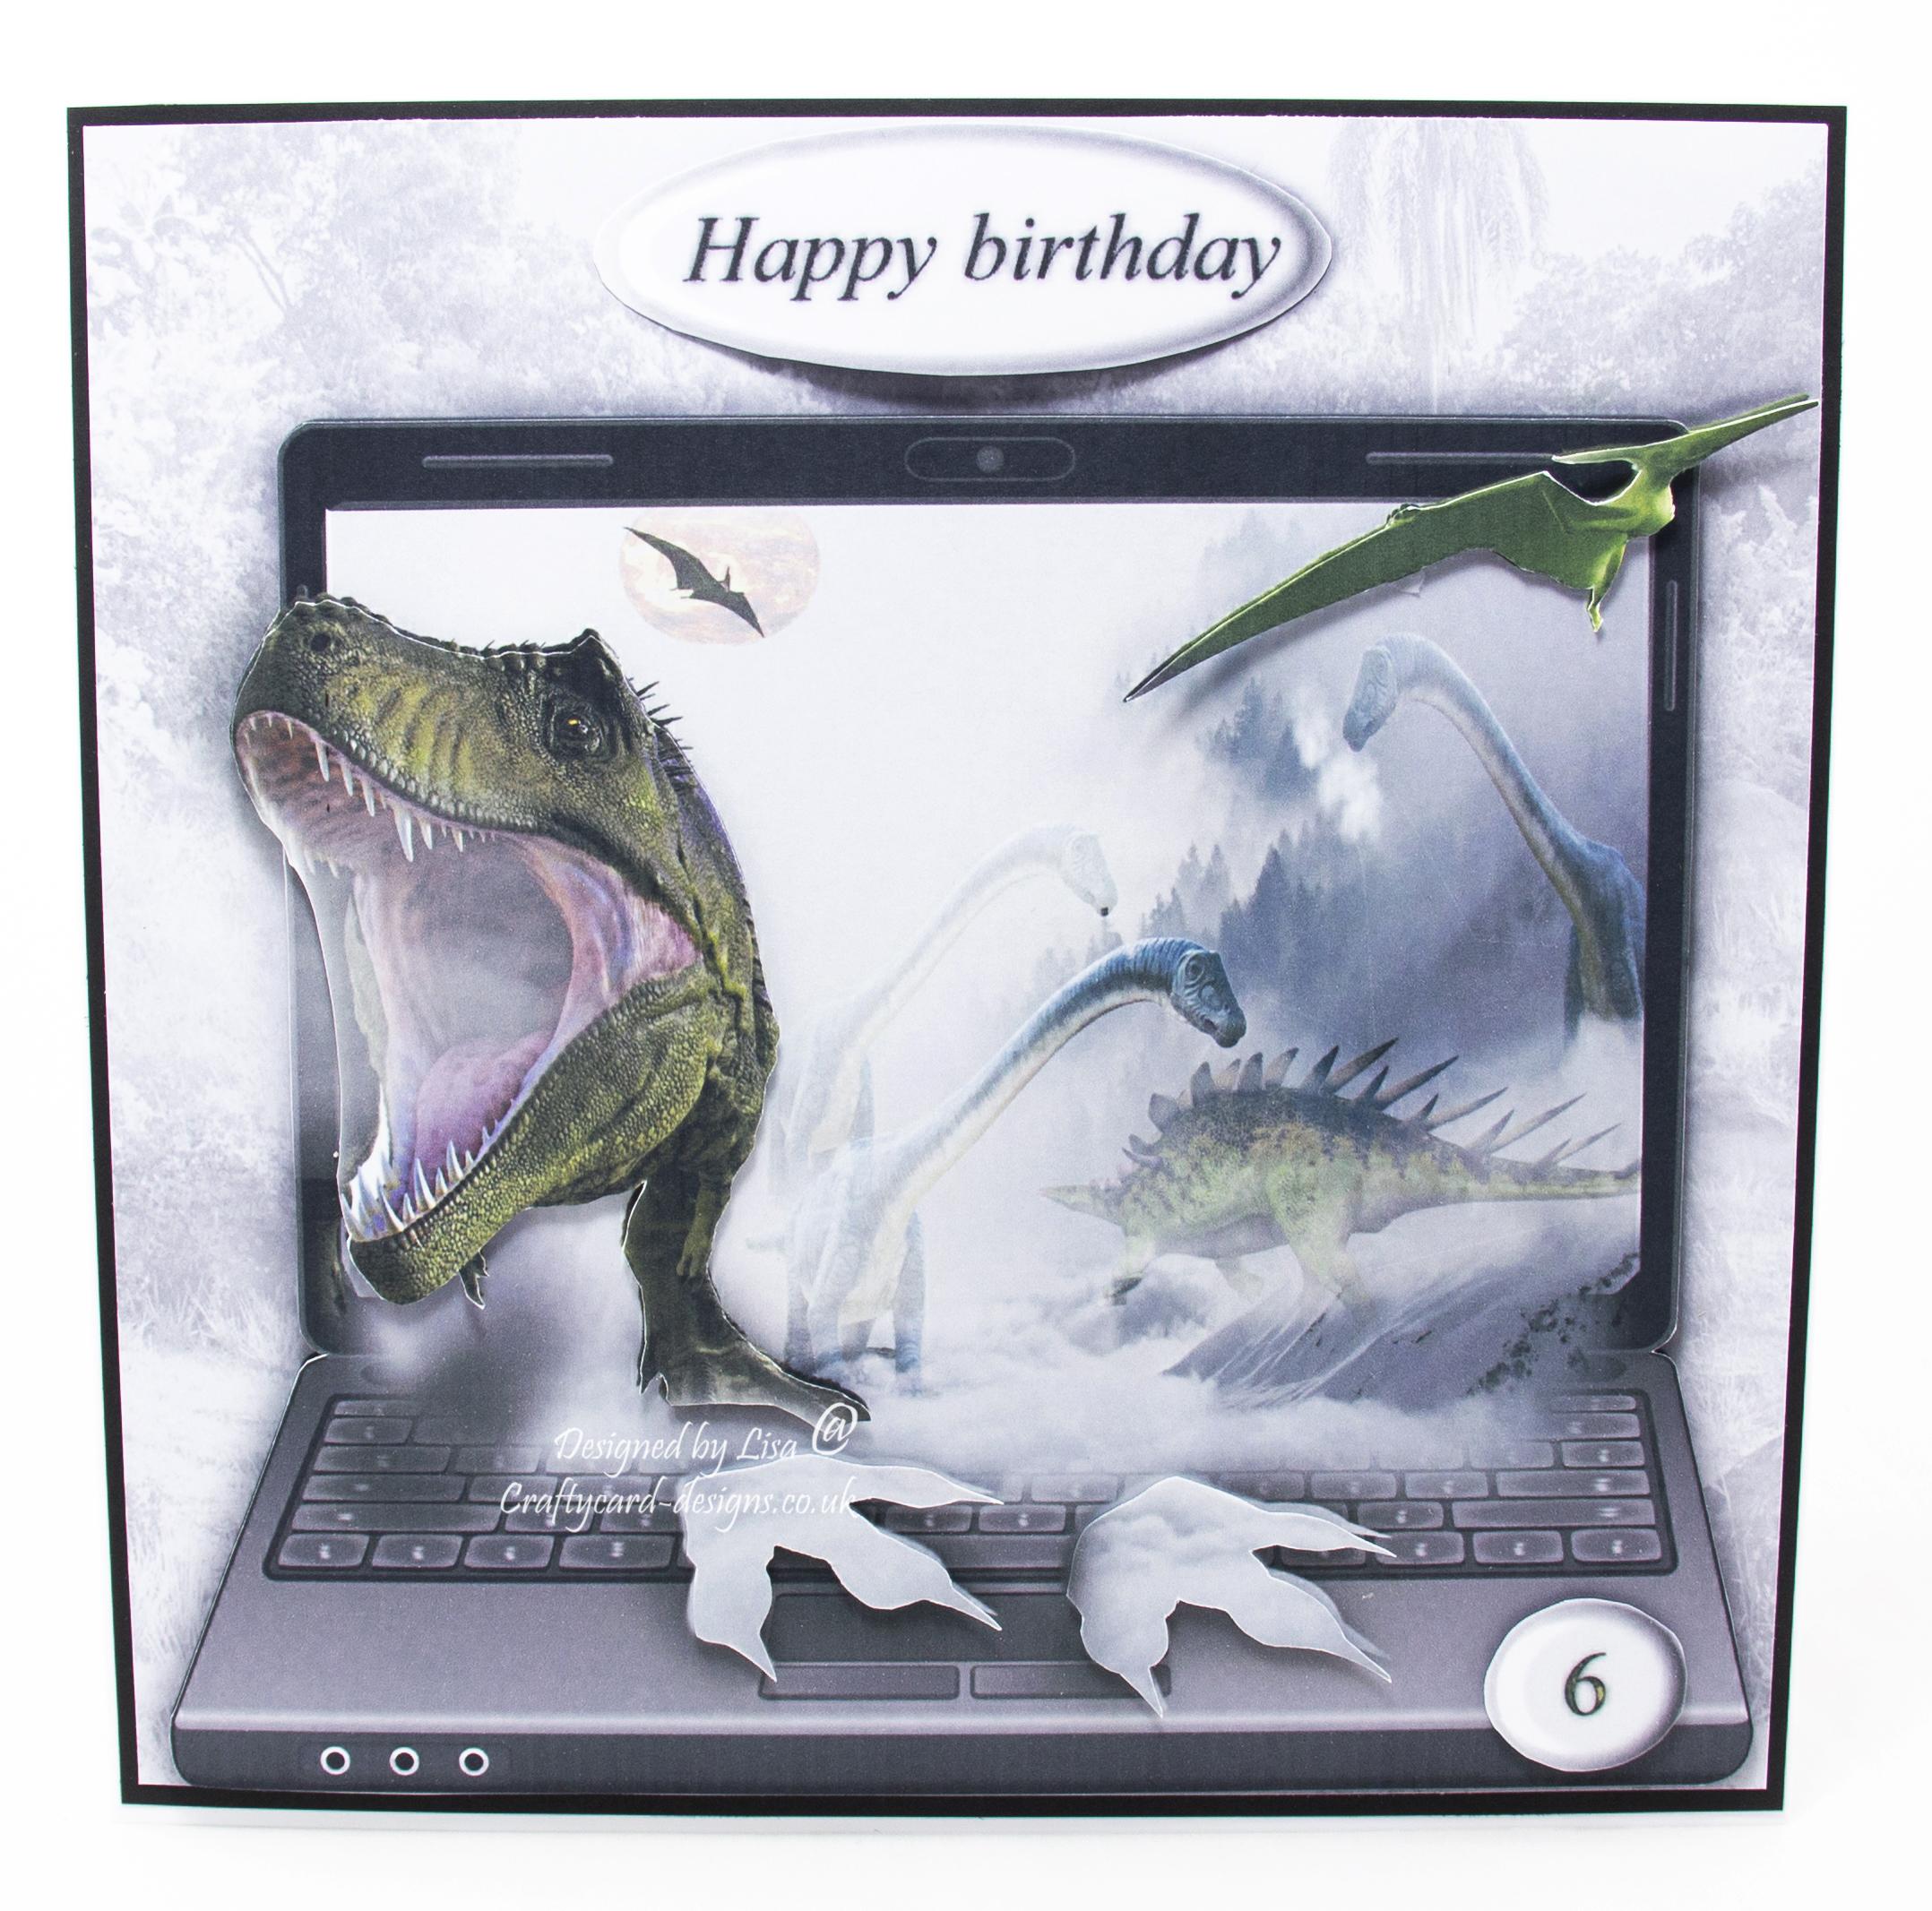 Handmade card using an image sheet from from Craftsuprint called Dinosaur Winter